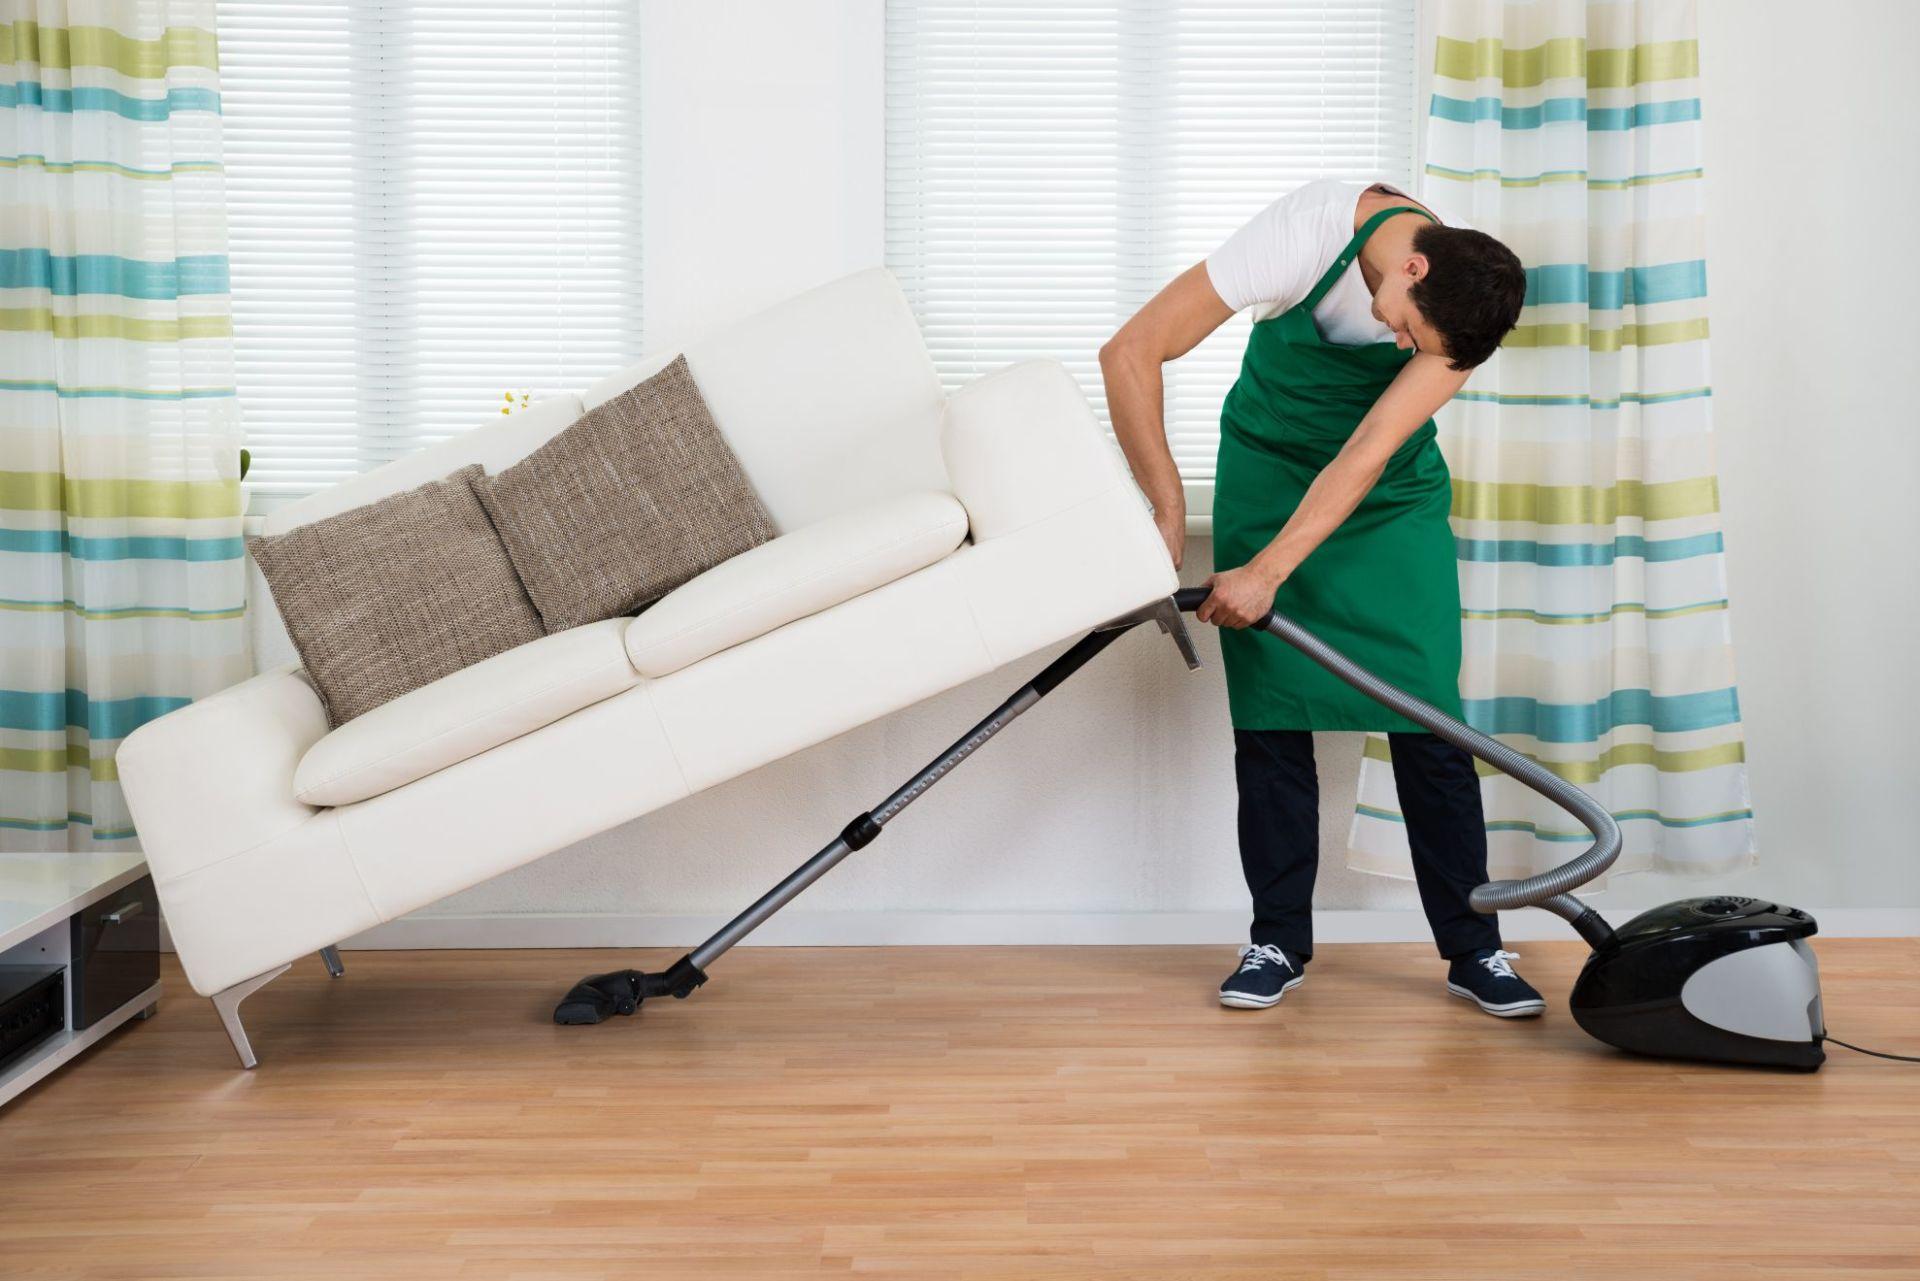 Как ускорить уборку квартиры: 7 секретов. клининг-эксперимент